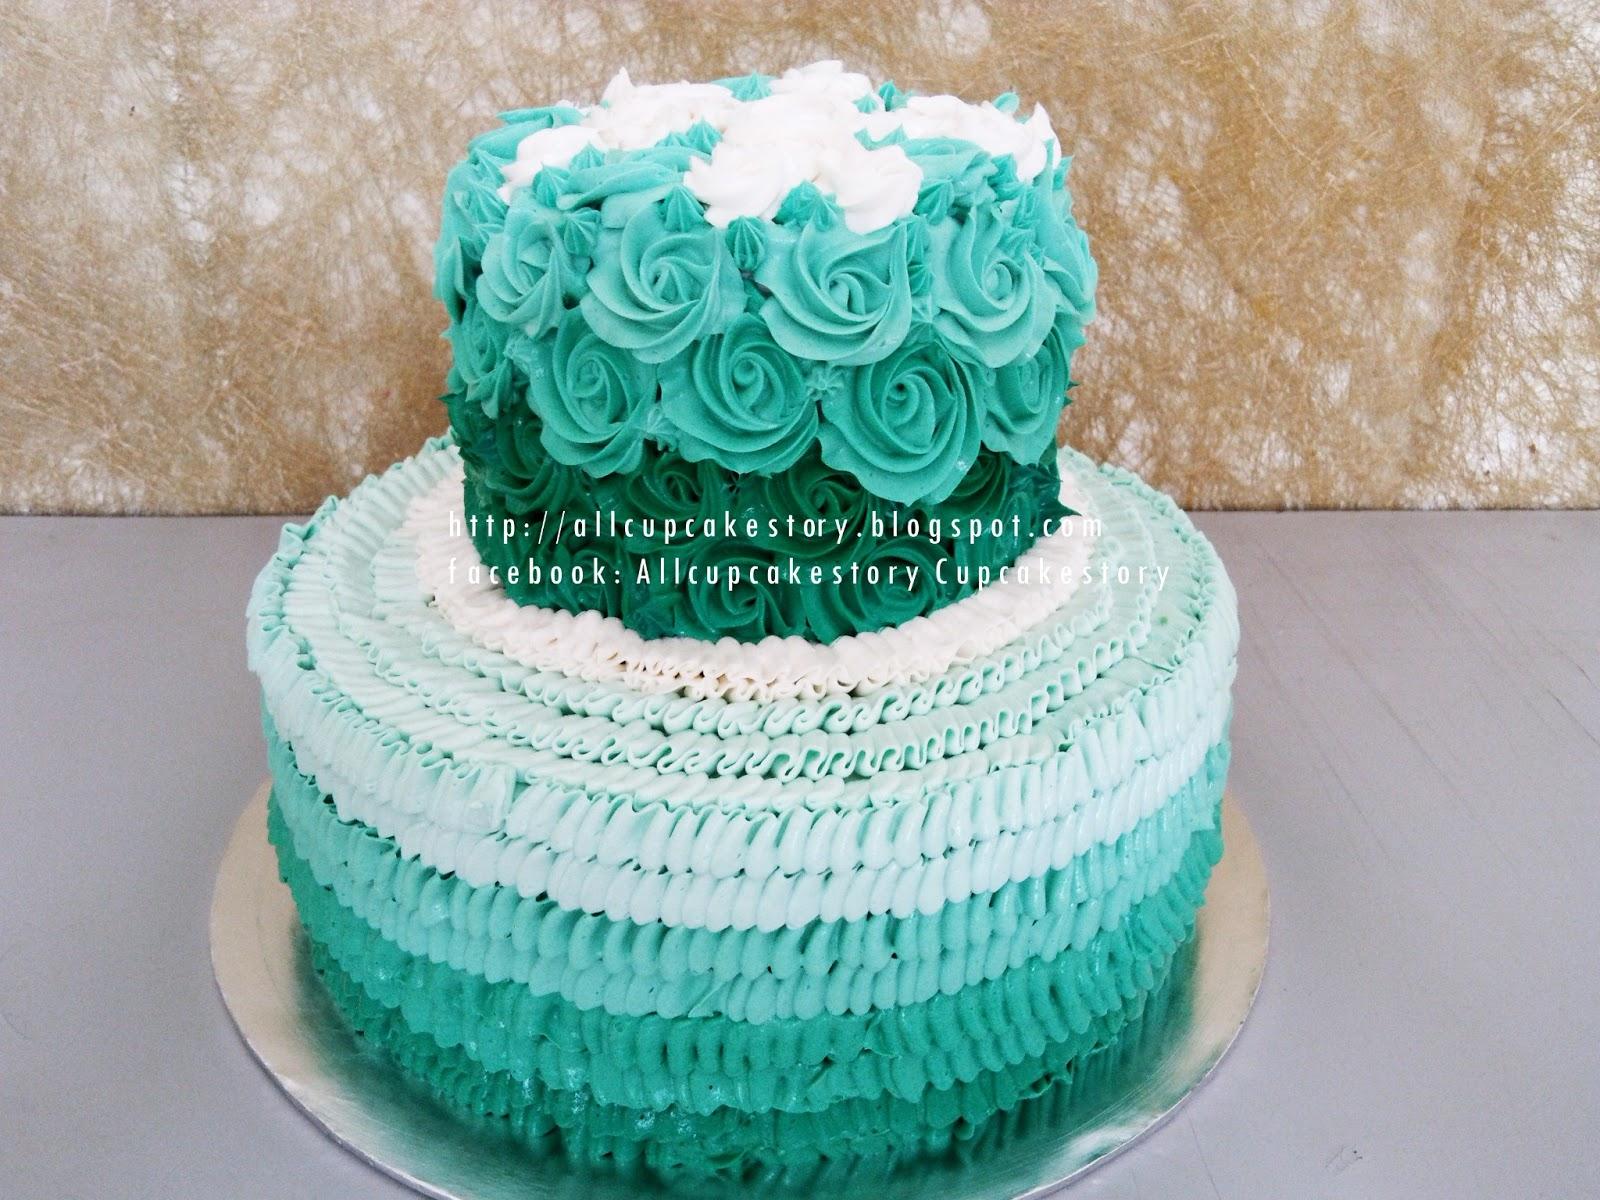 allcupcakestory turquoise rosette wedding cake. Black Bedroom Furniture Sets. Home Design Ideas